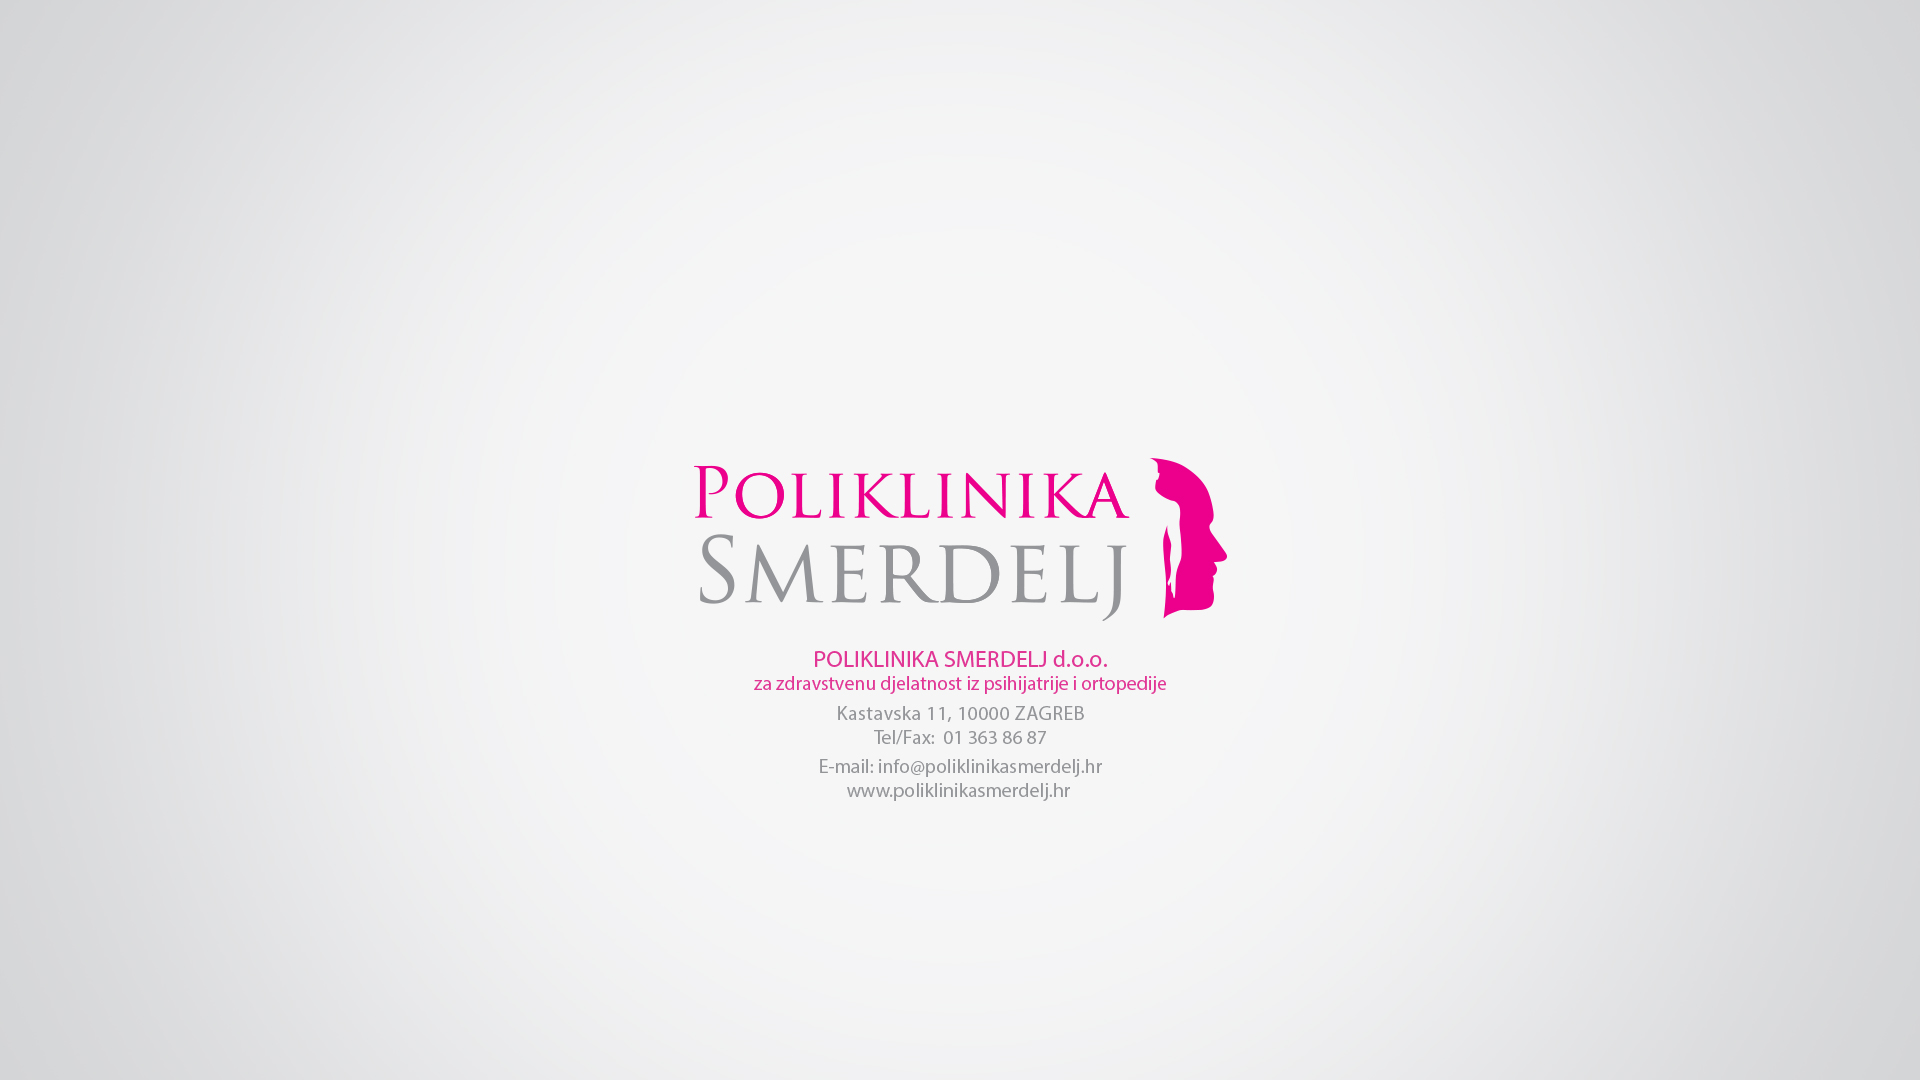 Poliklinika_smerdelj_homepage